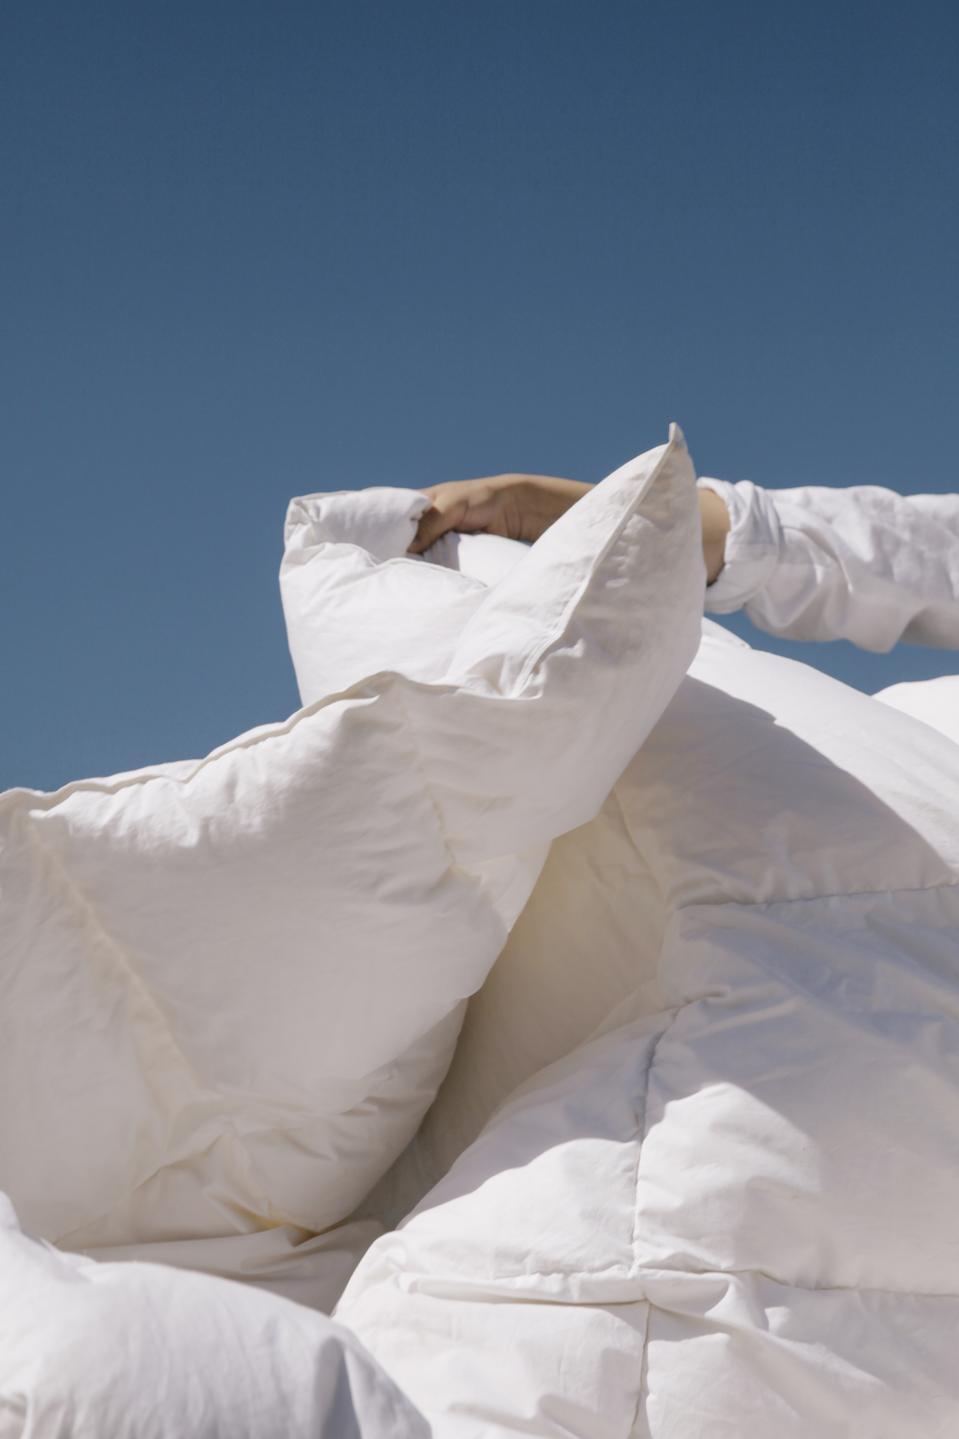 A white blanket.